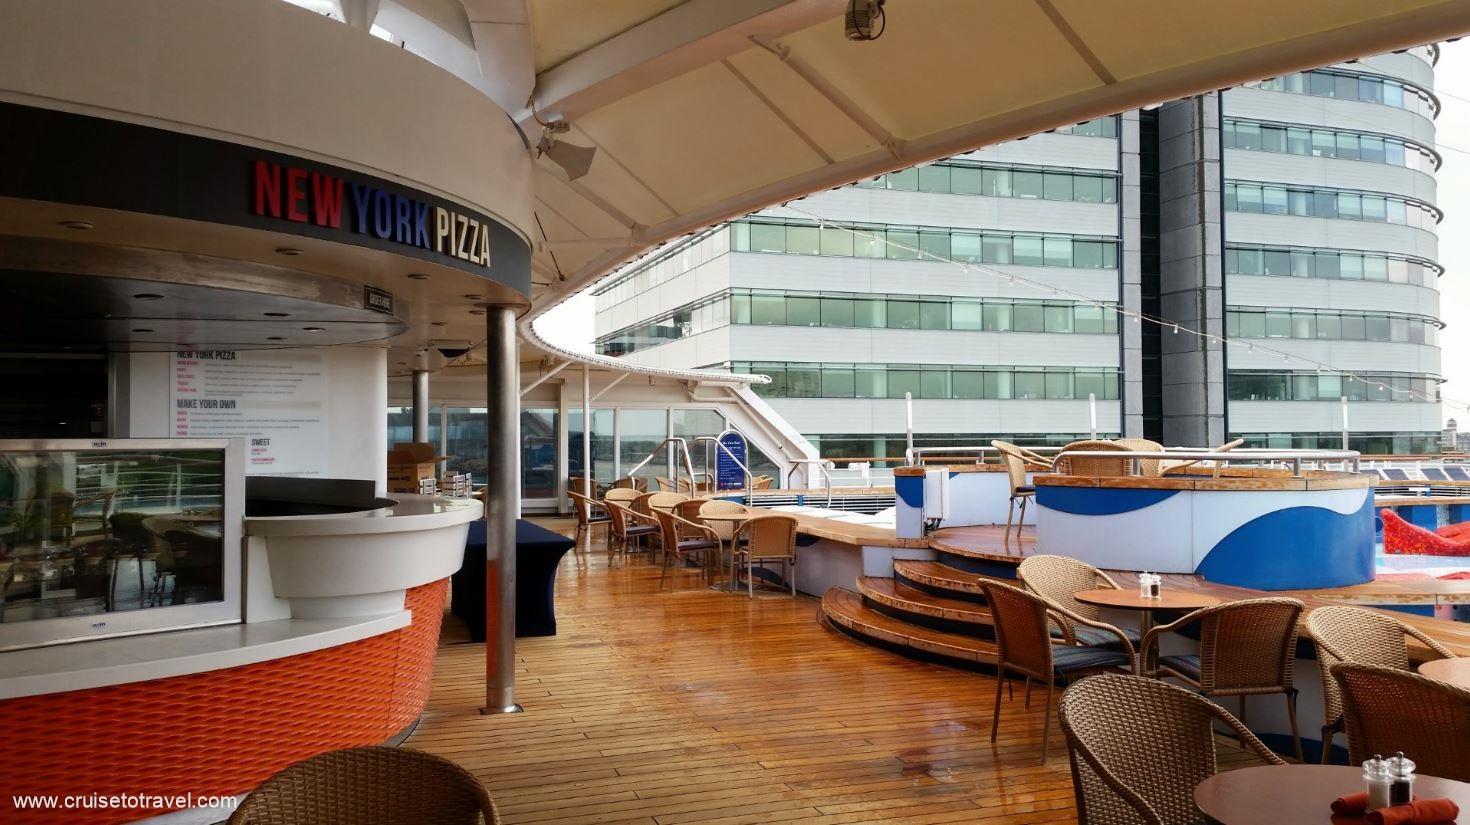 MS Rotterdam A Visit CruiseToTravel - Ms rotterdam